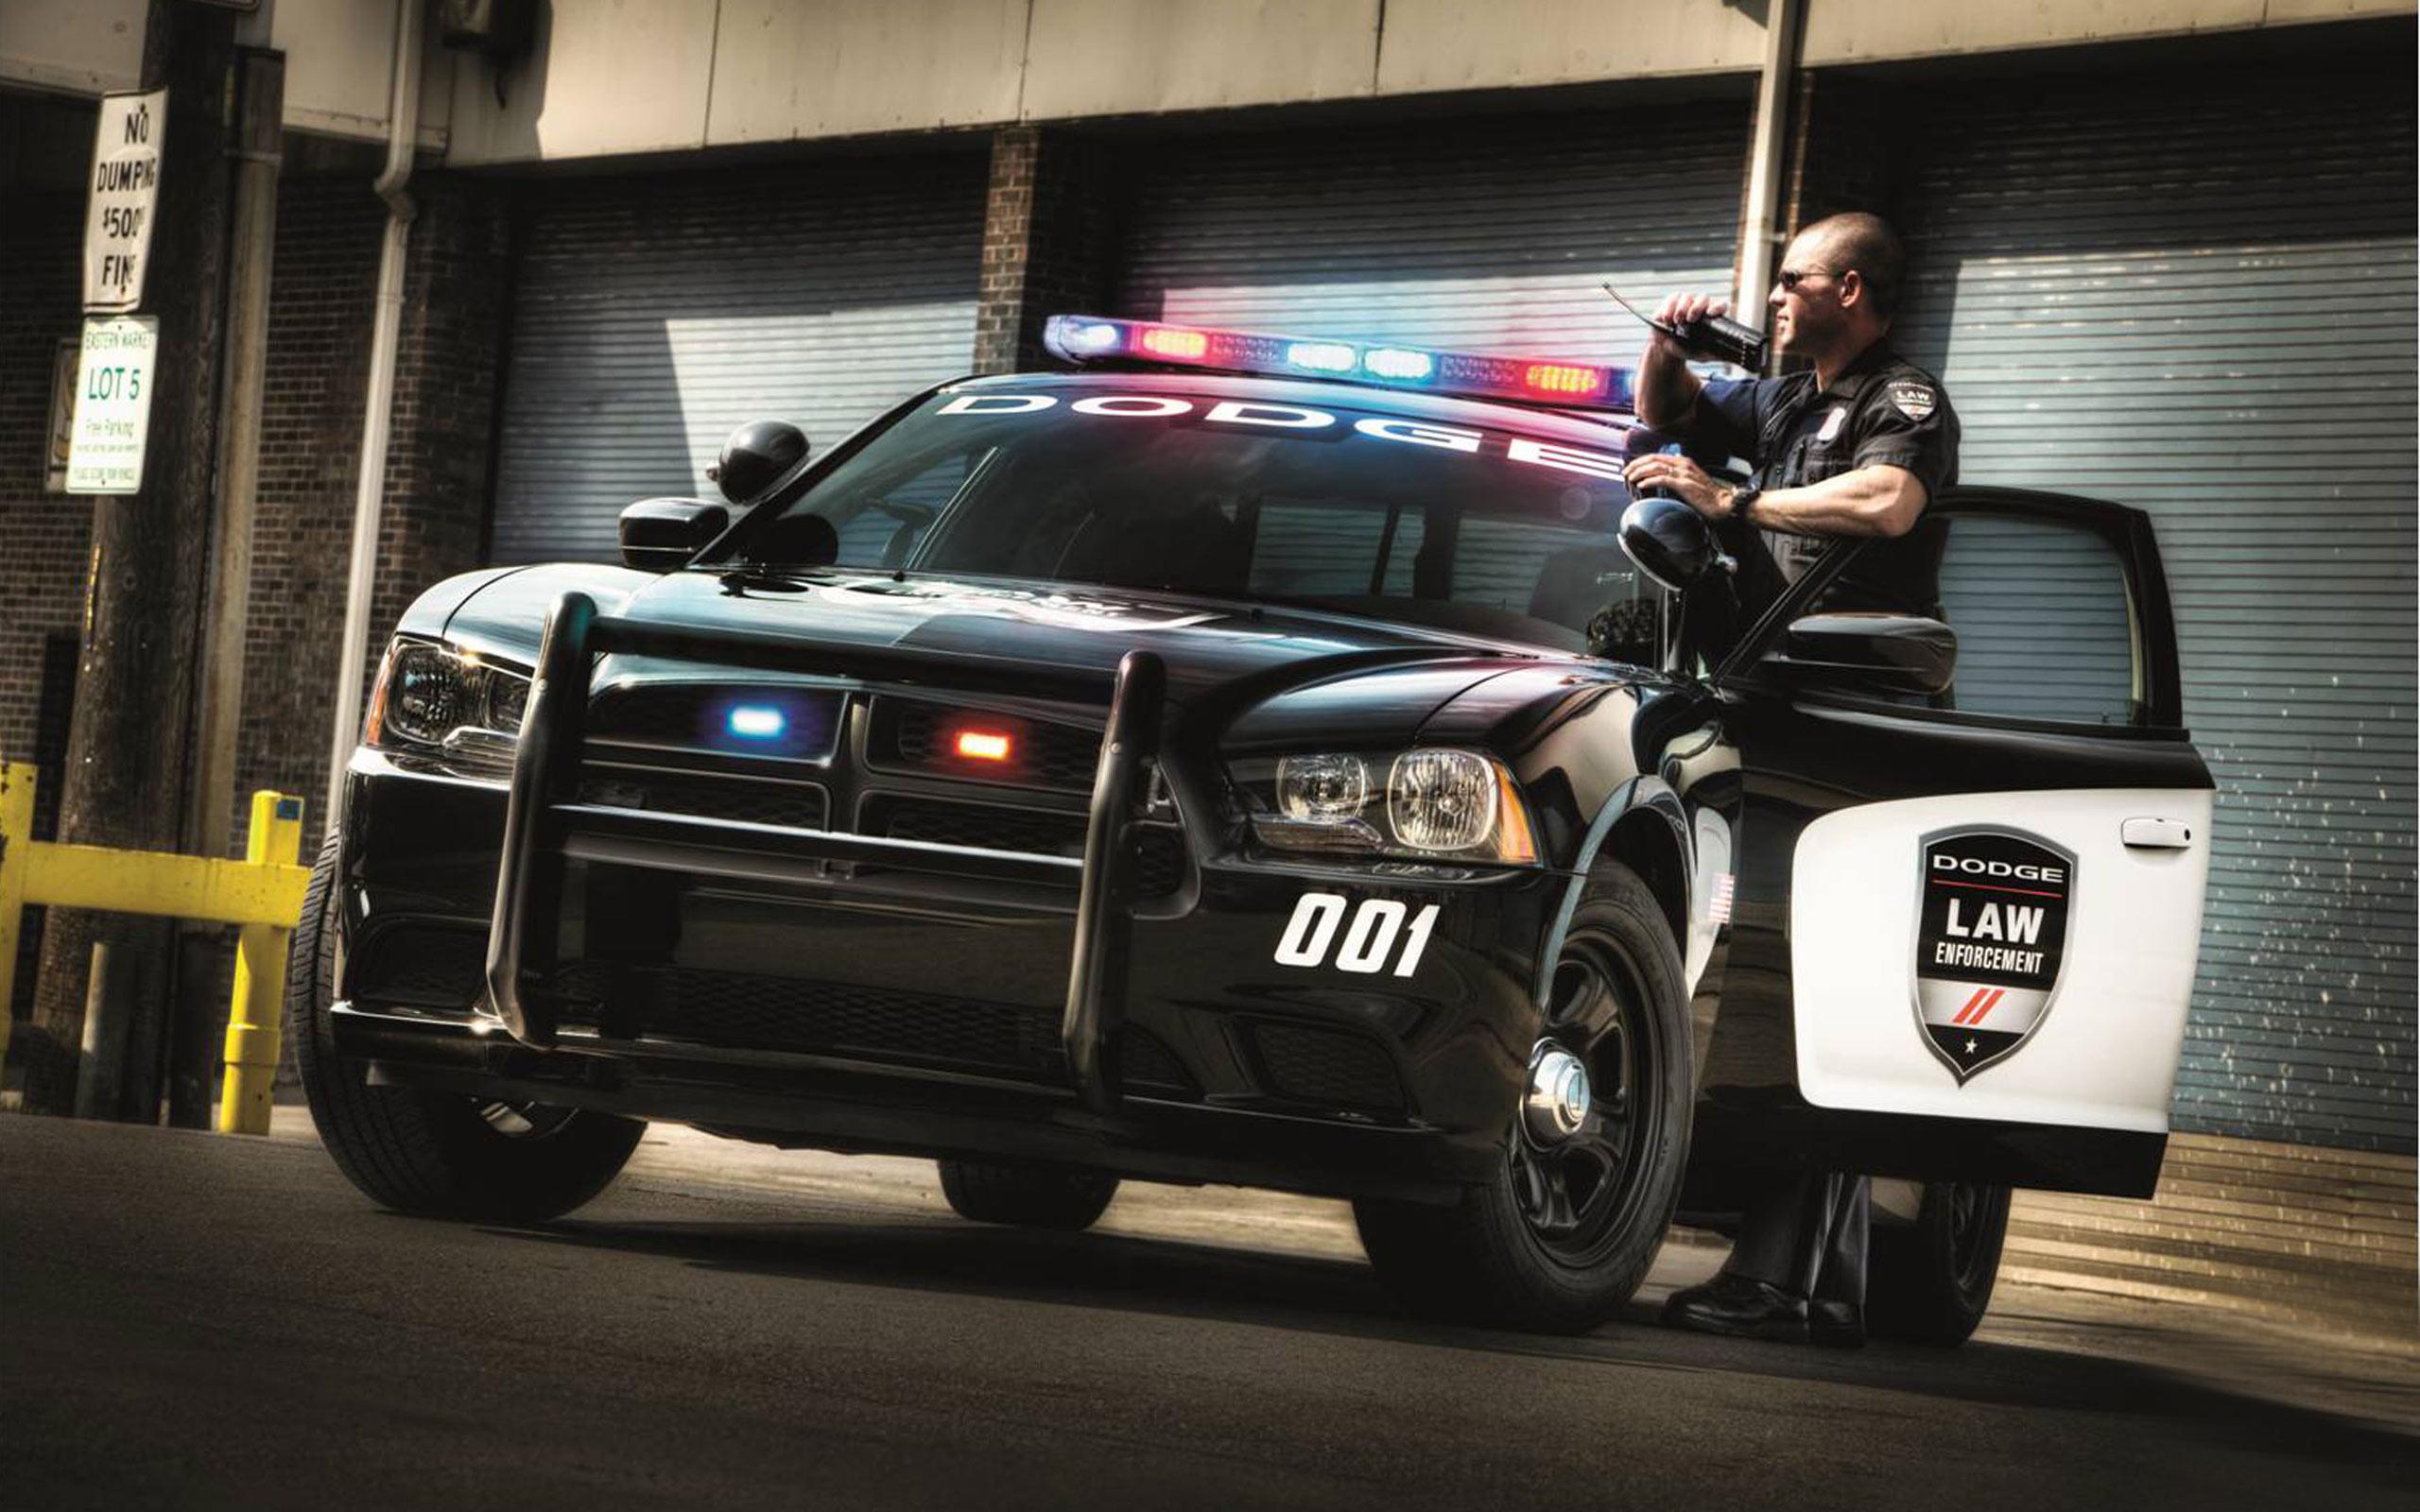 2014 Dodge Charger Pursuit 3 Wallpaper HD Car Wallpapers 2560x1600